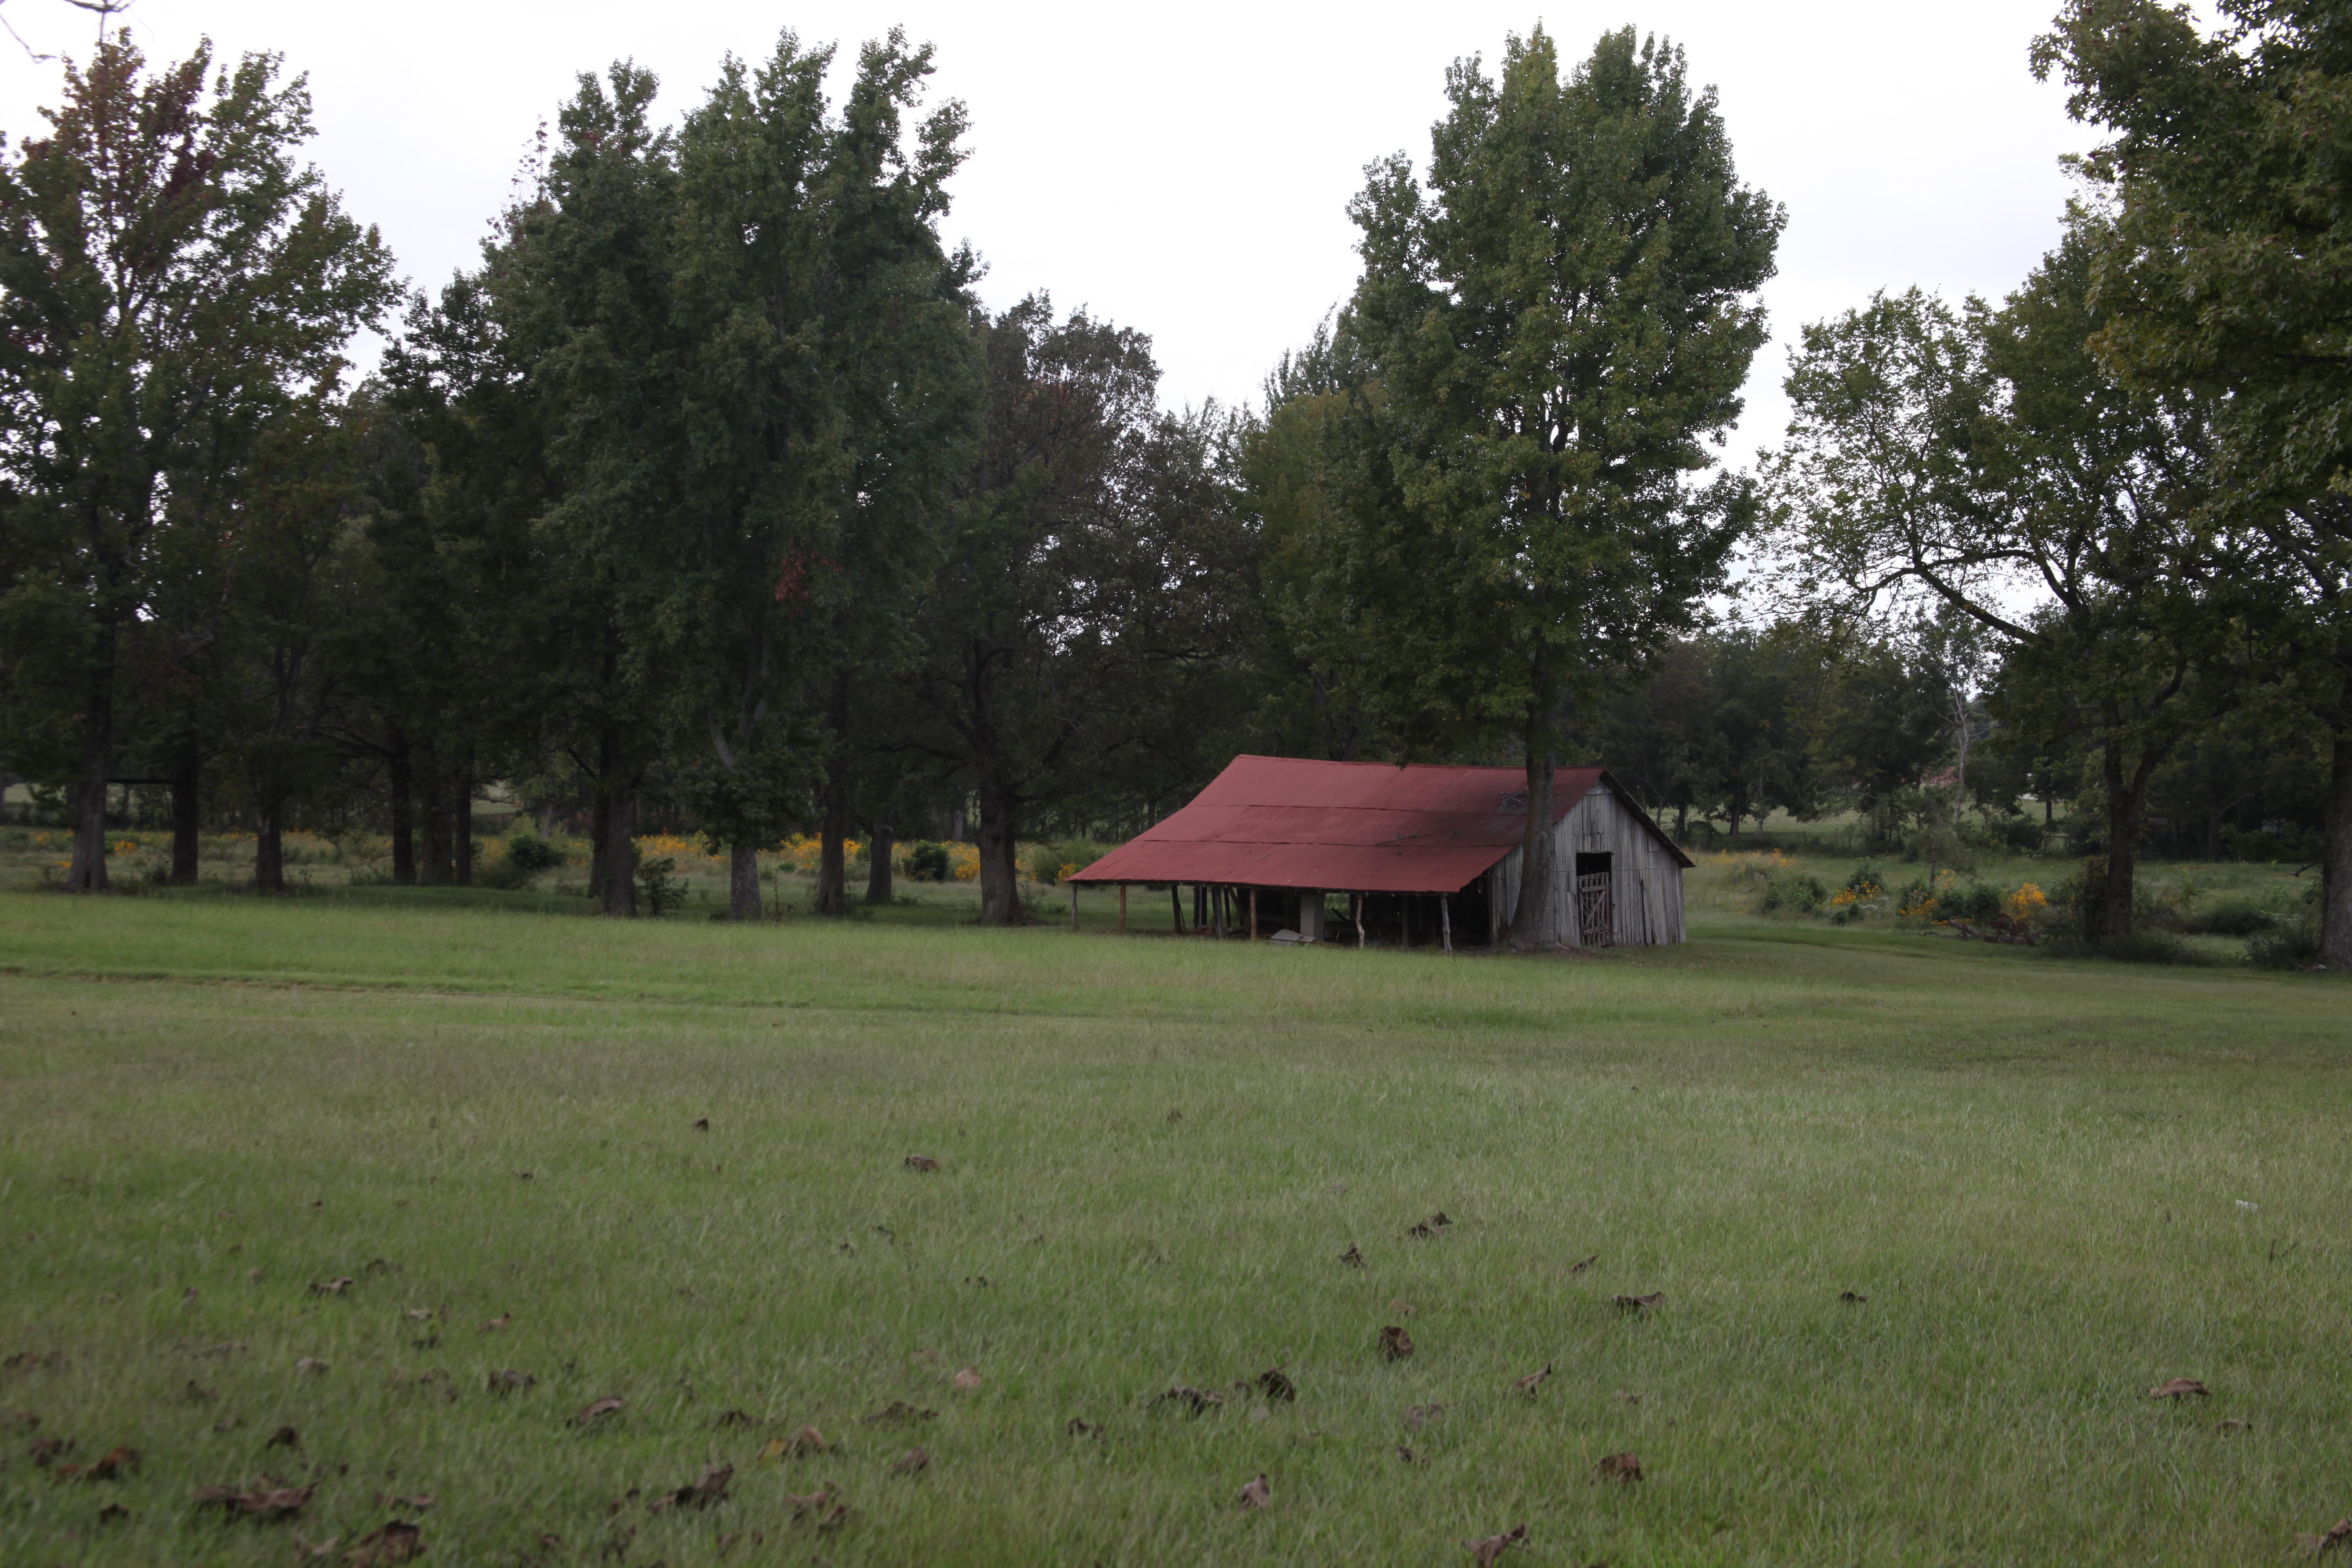 Old Barn, Scene, Old, Country, Barn, HQ Photo